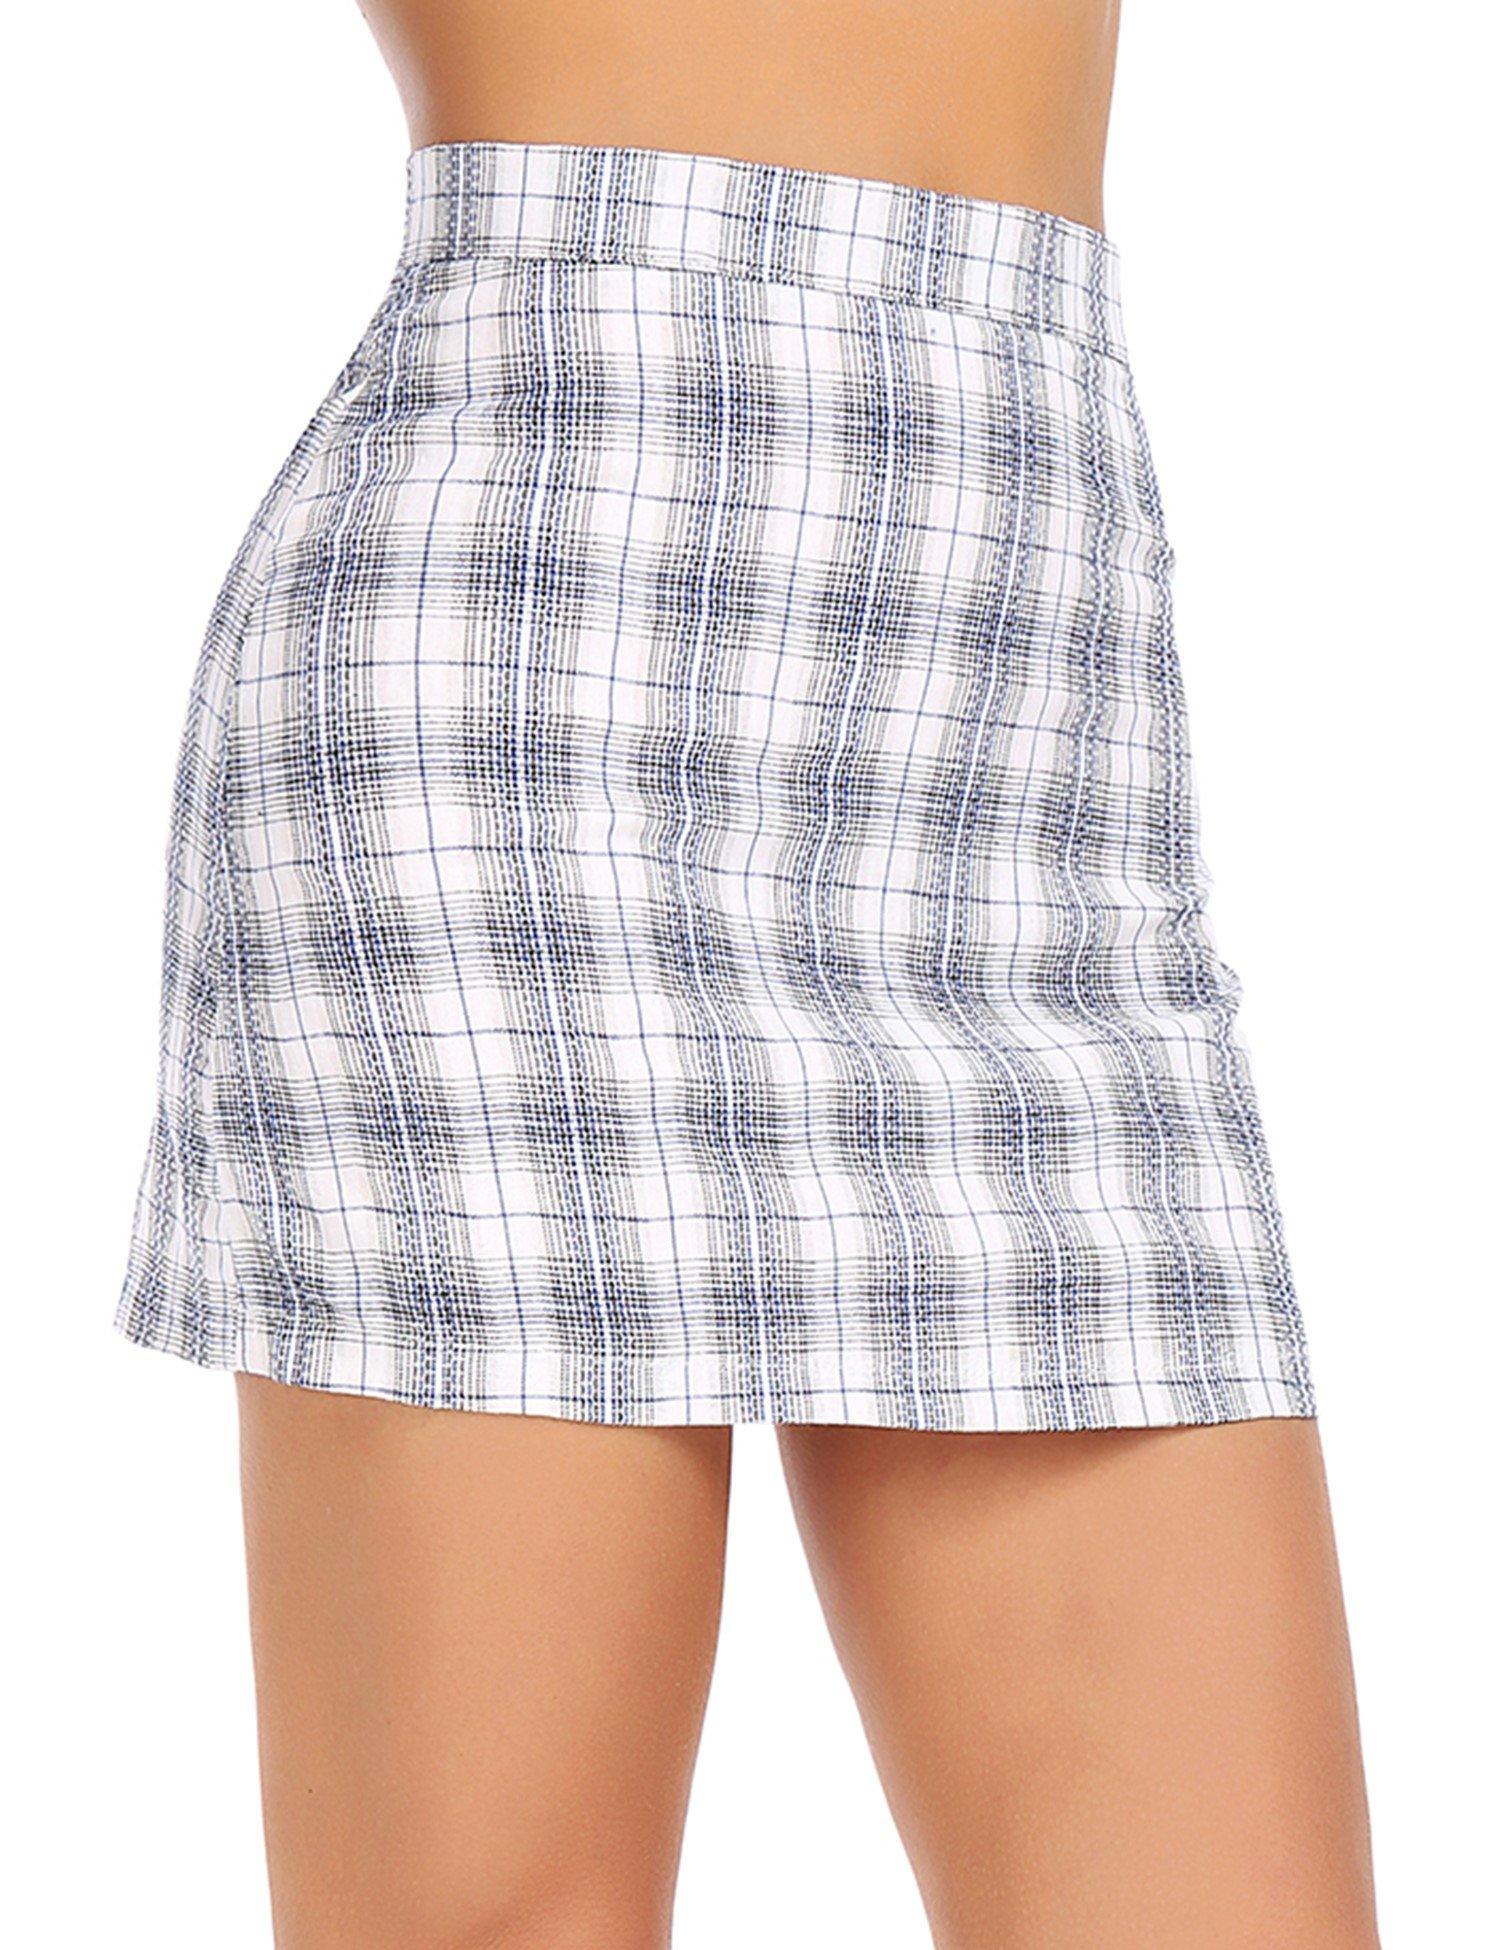 FISOUL Women's High Waist Bodycon Mini Skirt School Girl Plaid Uniform Skirt Black M